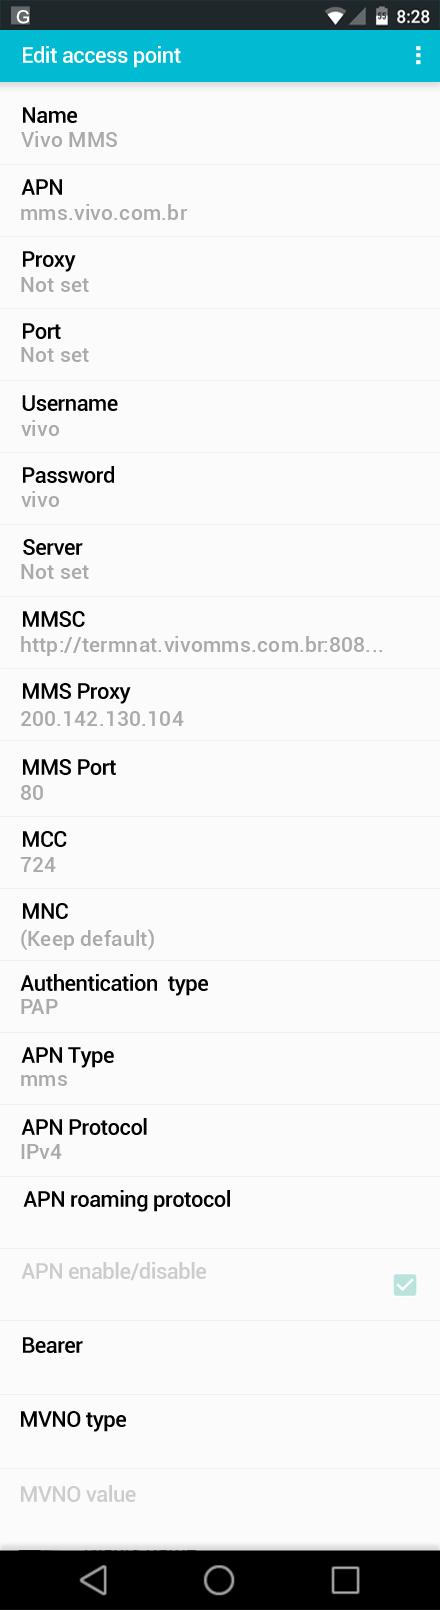 Vivo MMS APN settings for Android screenshot